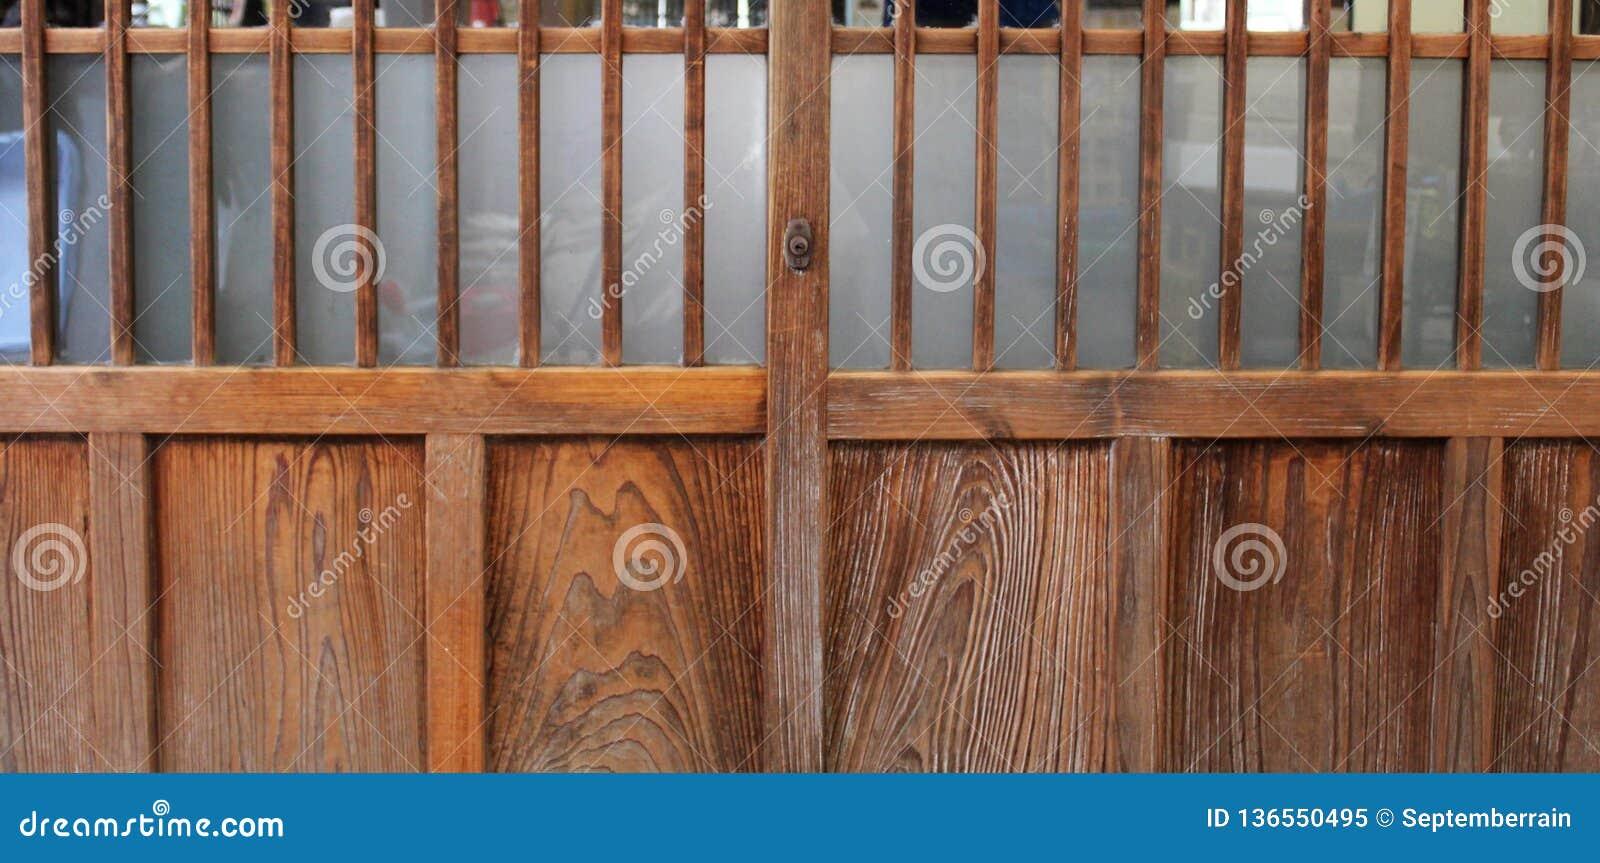 Japanese Style Exterior Sliding Doors Stock Image Image Of Common Element 136550495